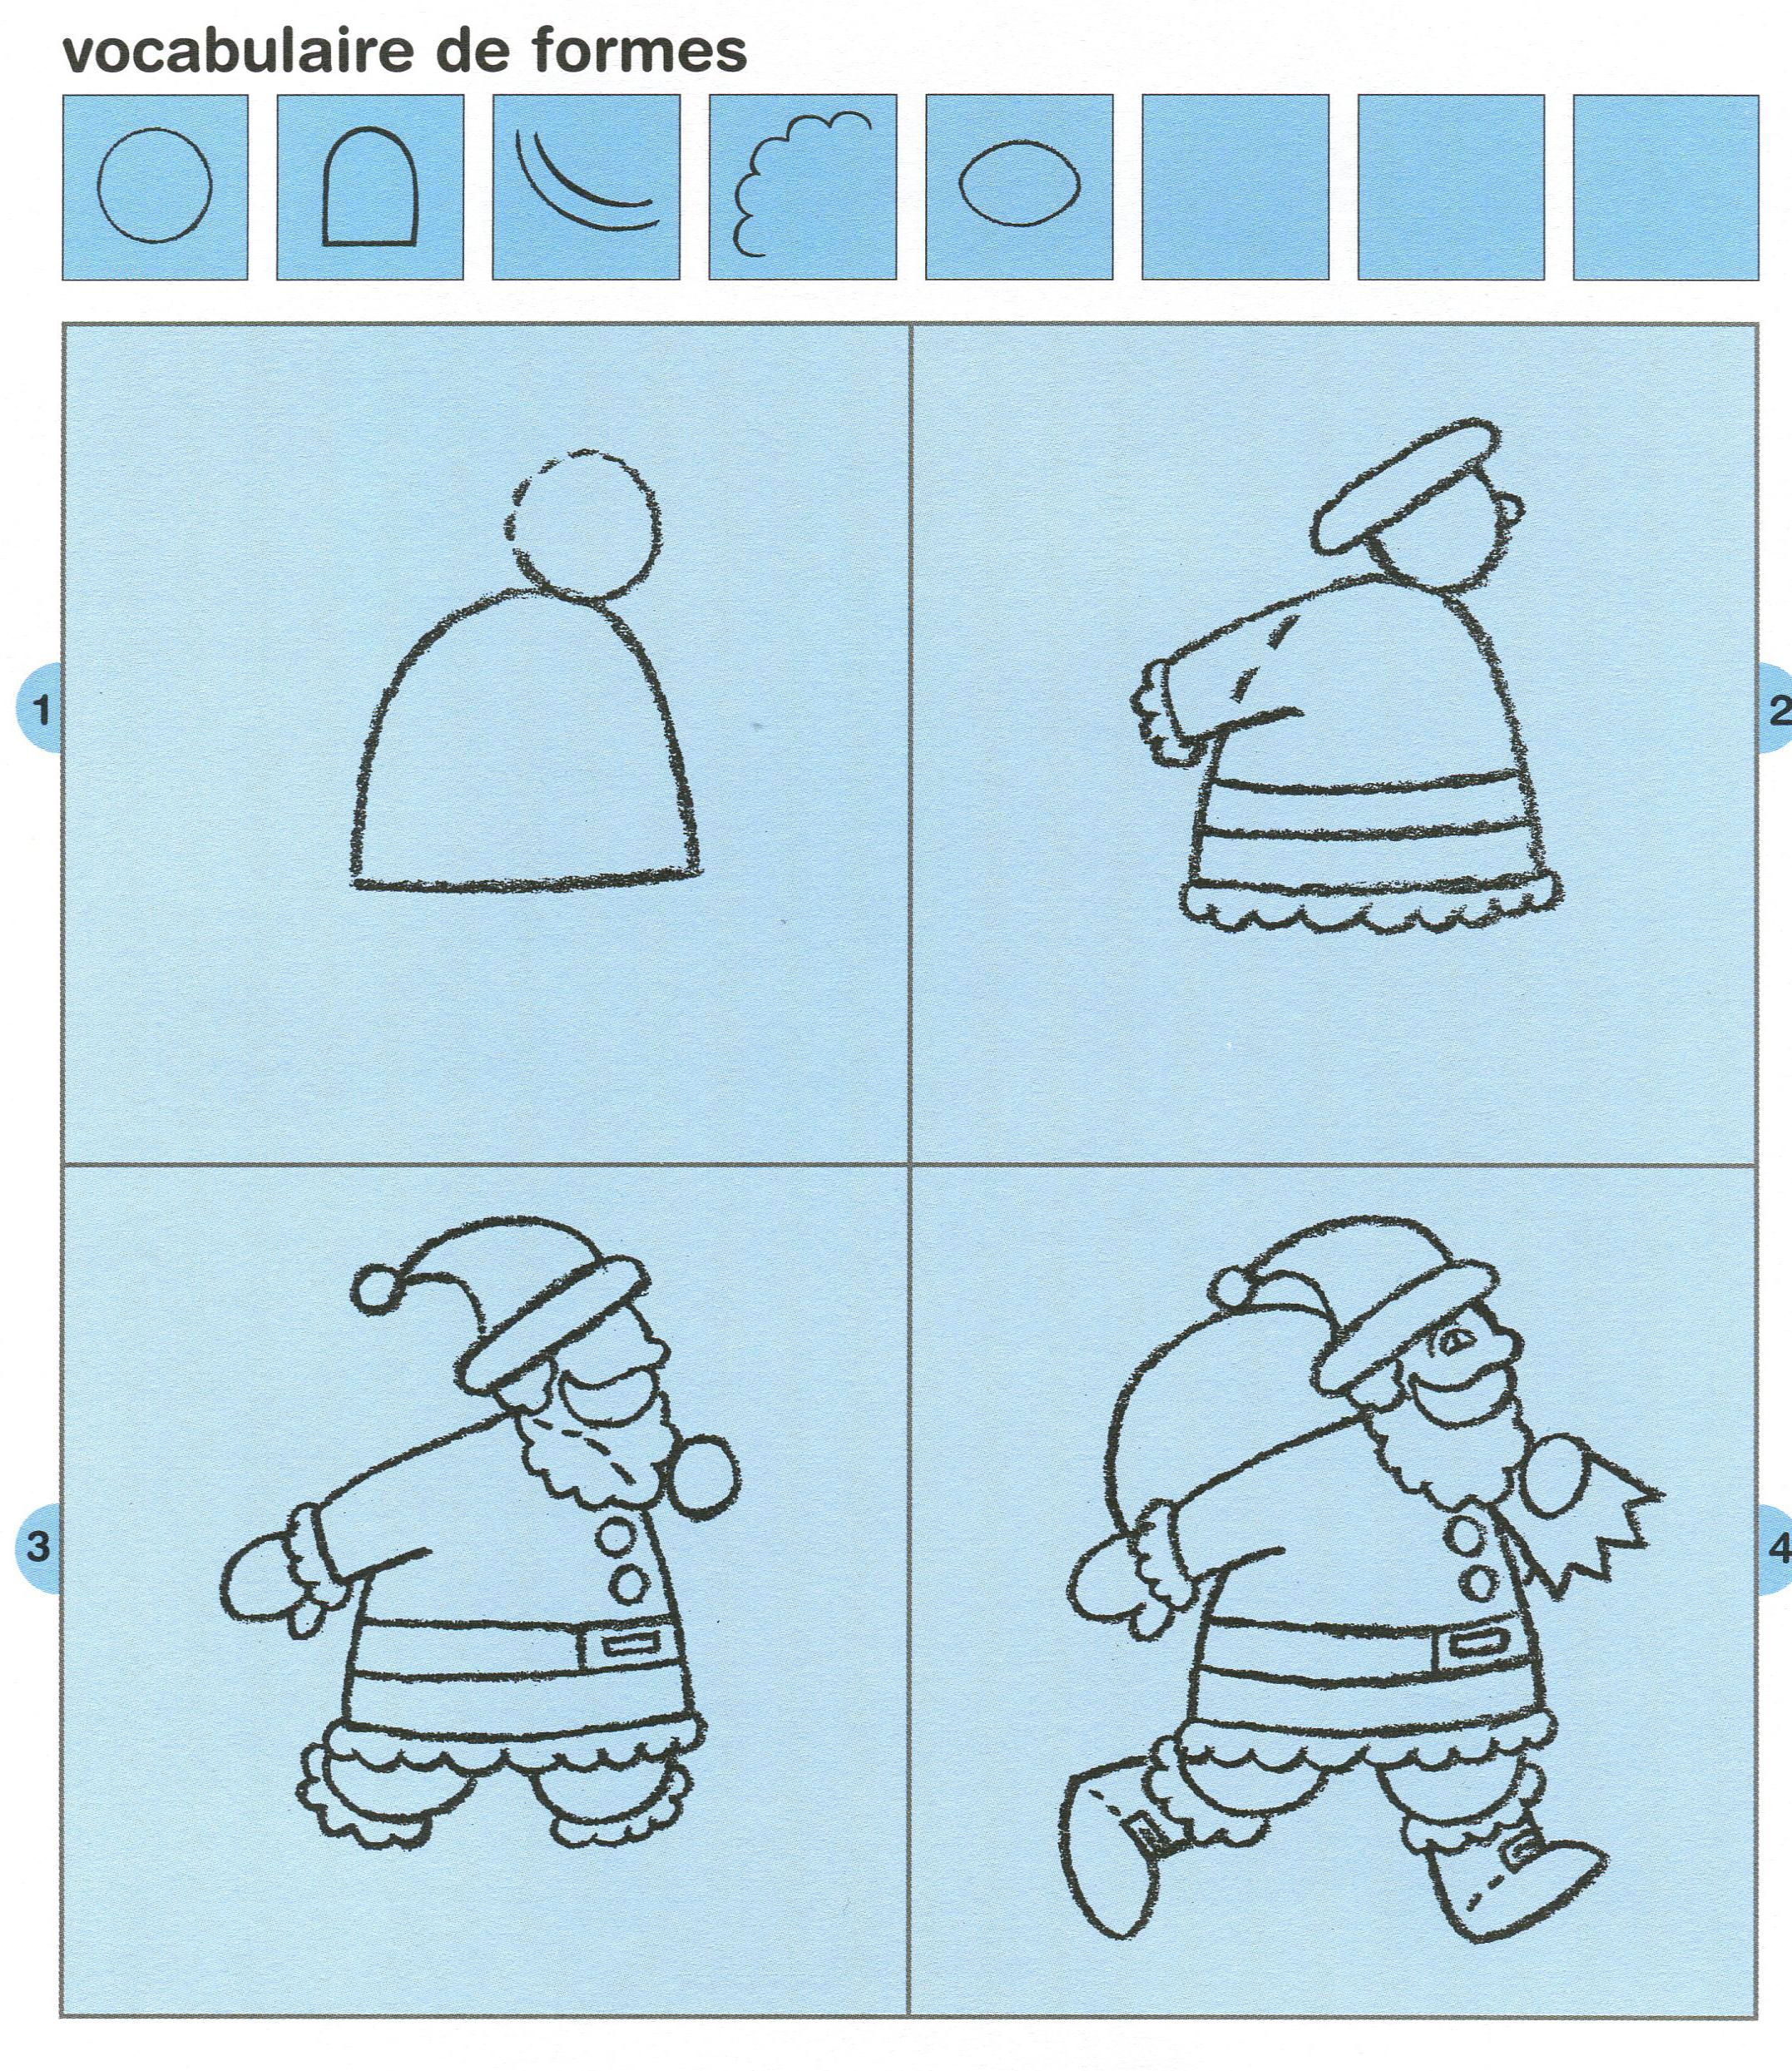 Image Dessin De Noel - Ohbq avec Comment Dessiner Le Pere Noel